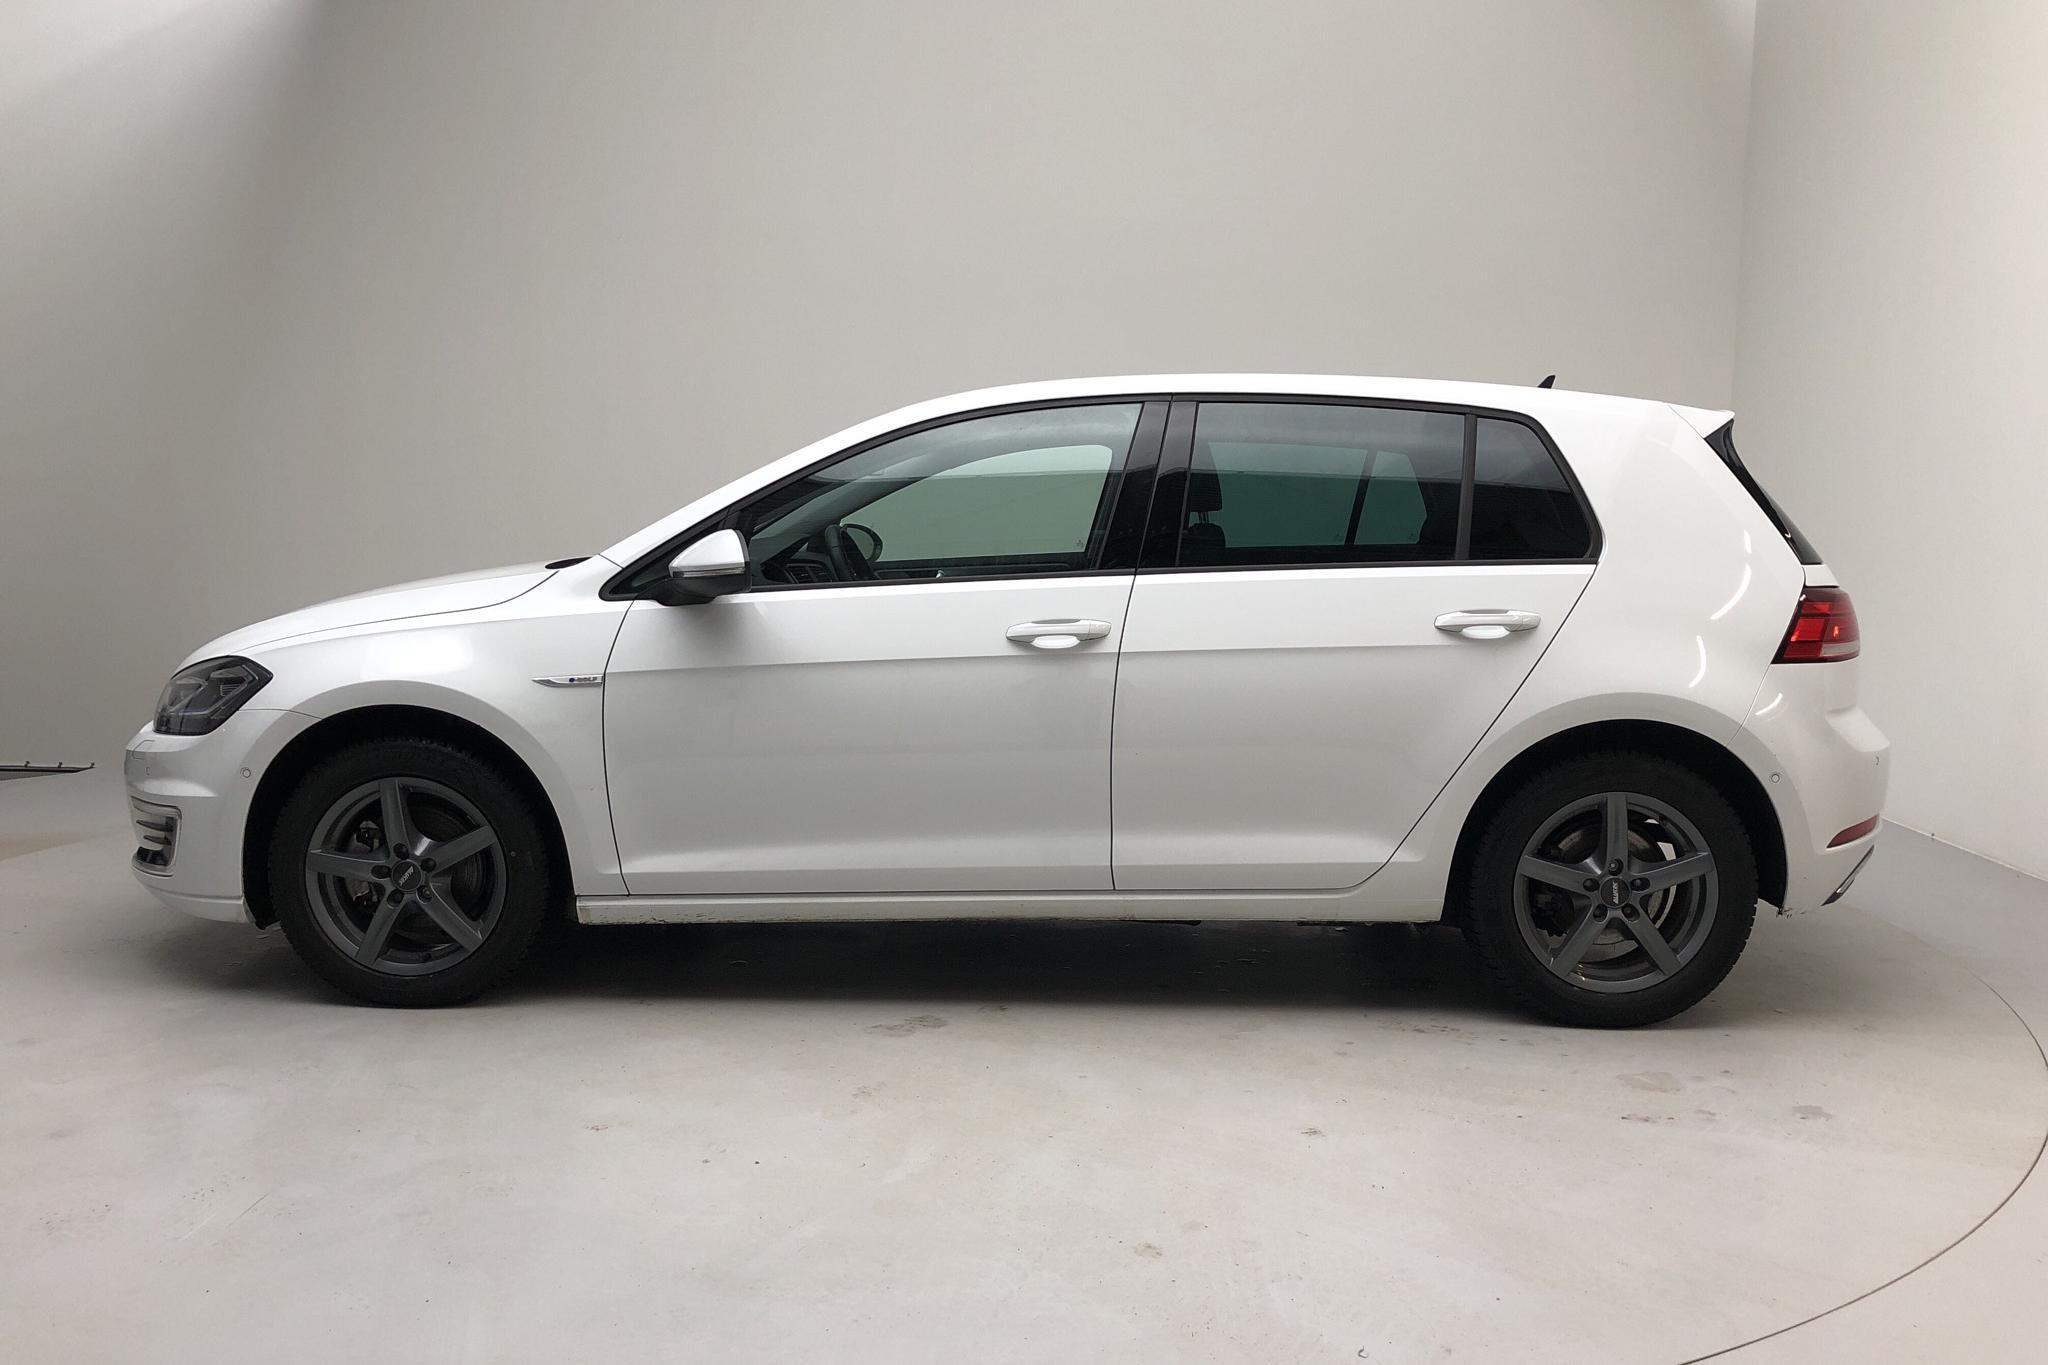 VW e-Golf VII 5dr (136hk) - 27 640 km - Automatic - white - 2019